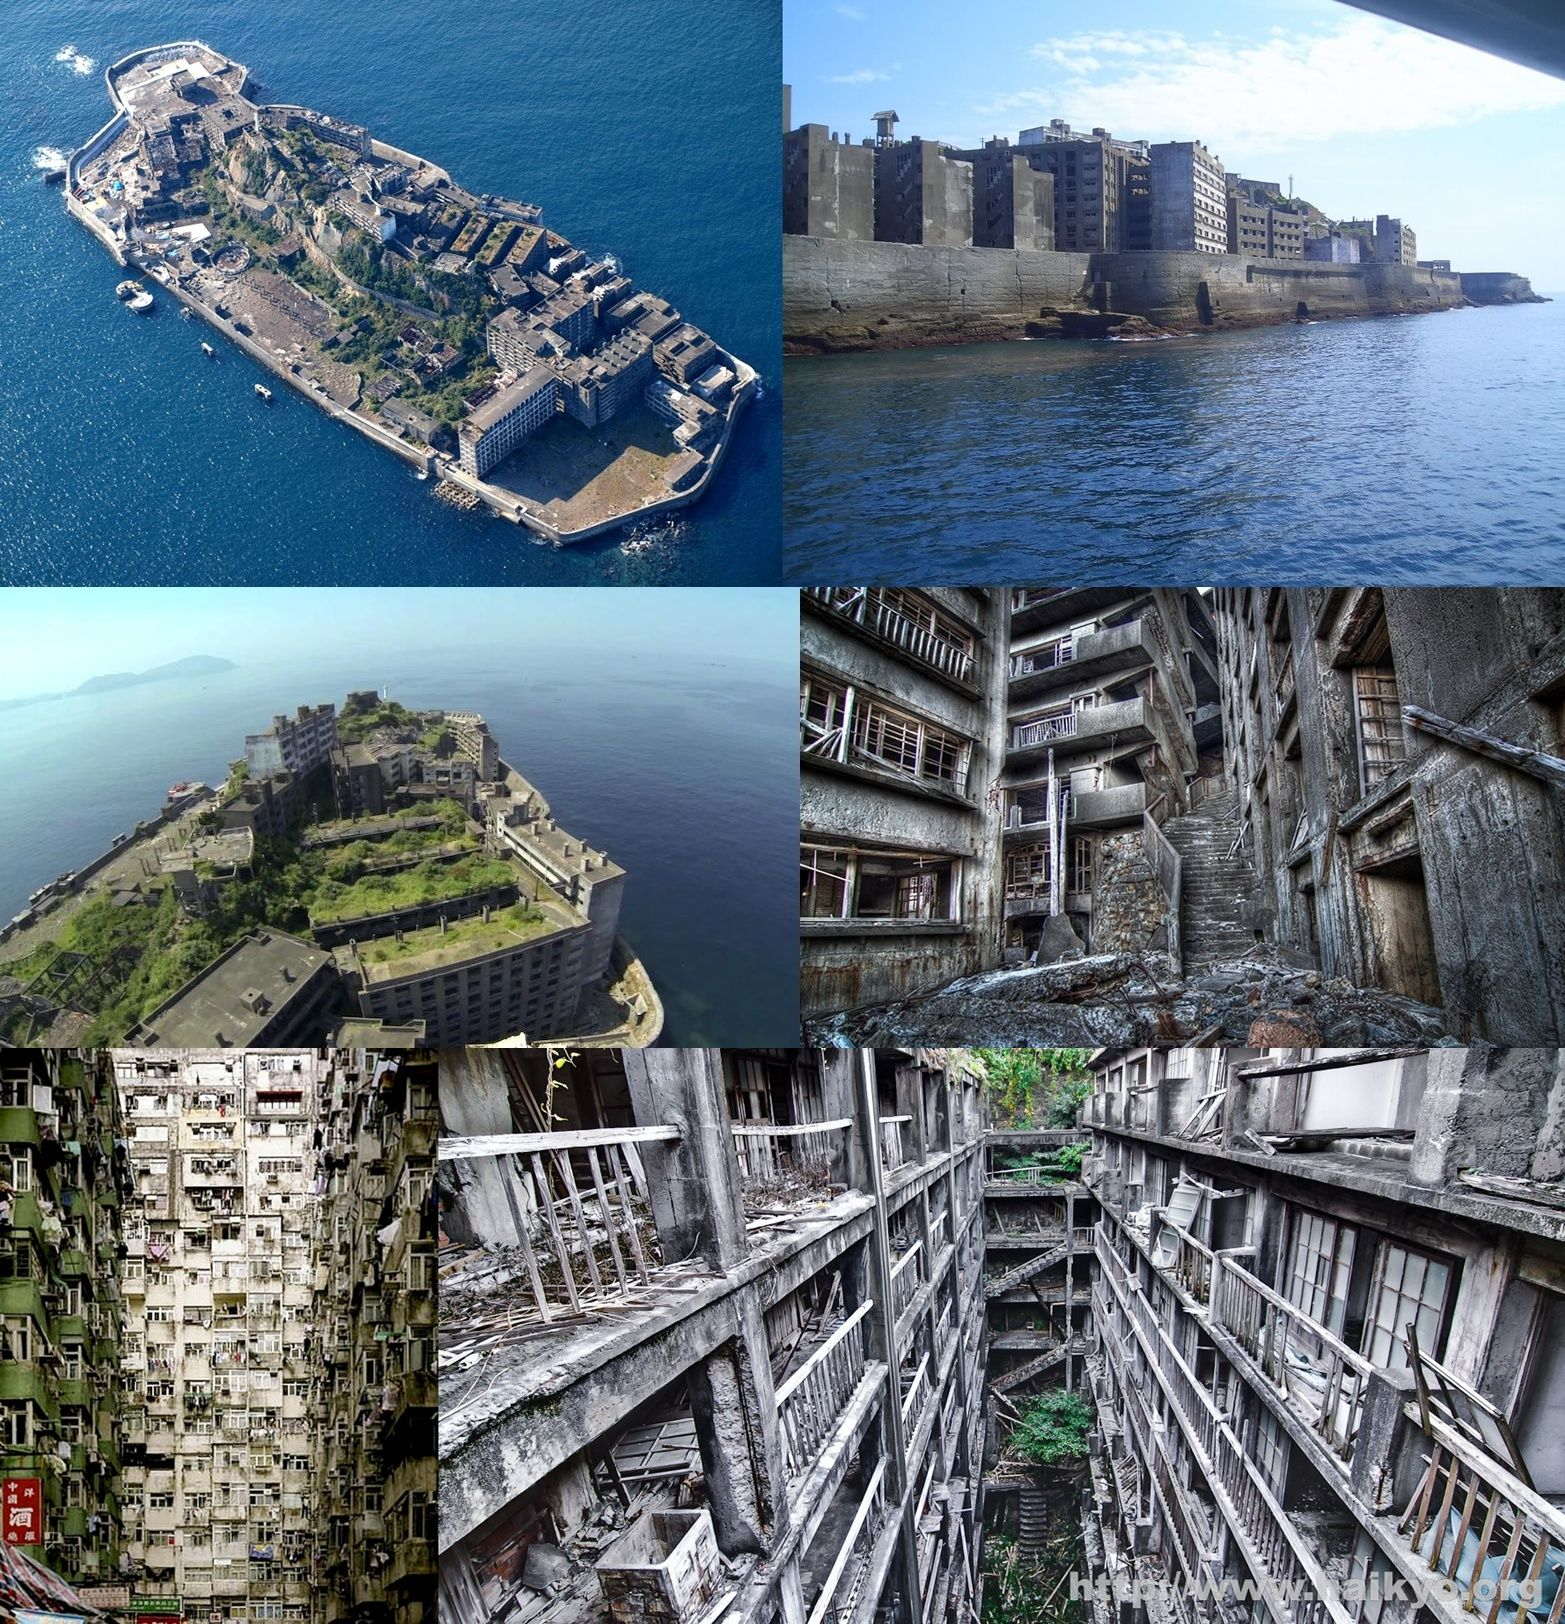 Hashima Island, Japan. In The Past Hashima Island Was Rich